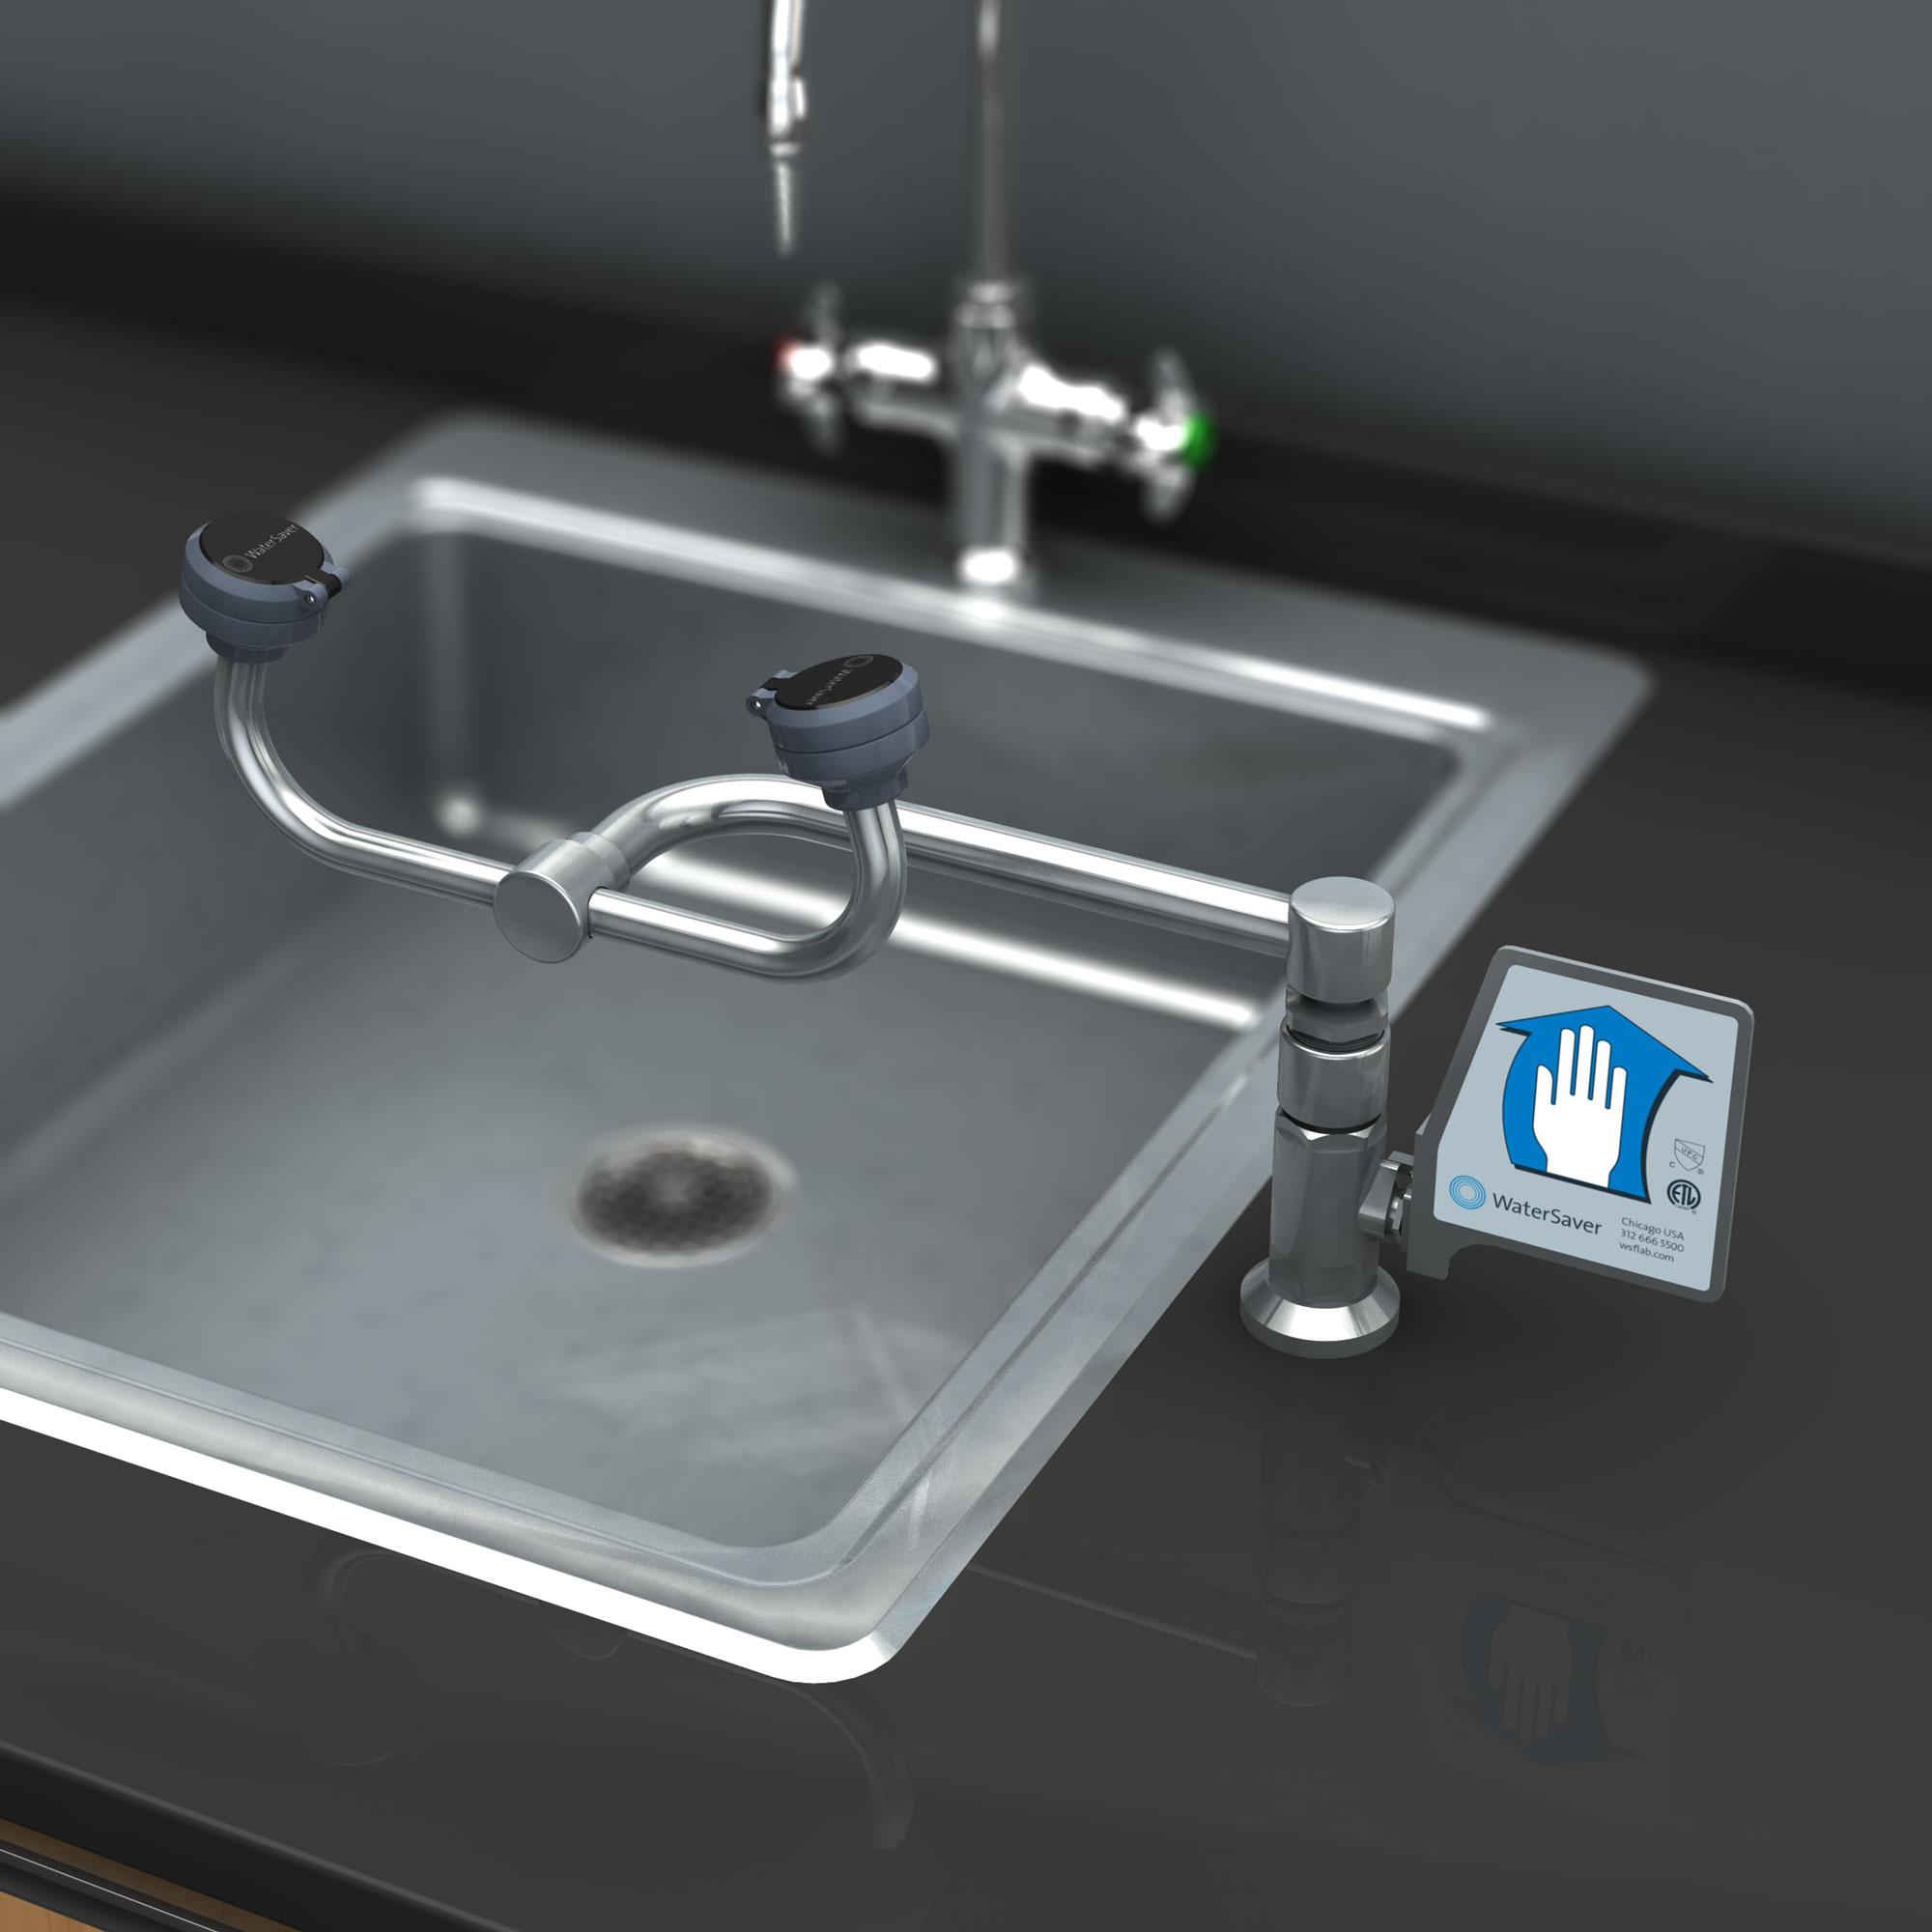 EW893 – WaterSaver Faucet Co.